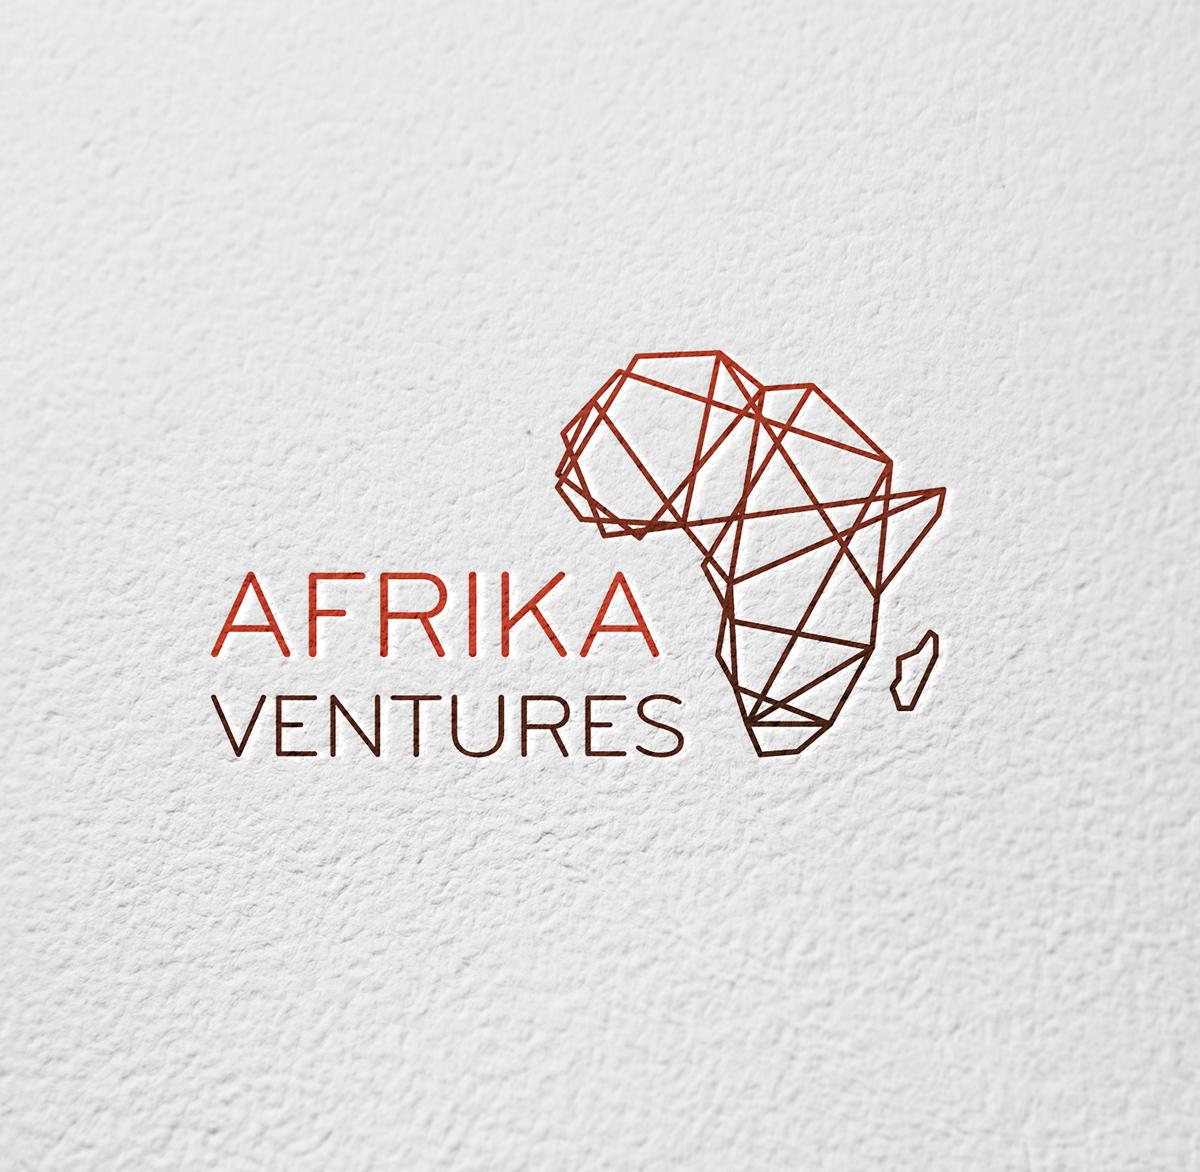 Afrika Ventures Corporate Identity